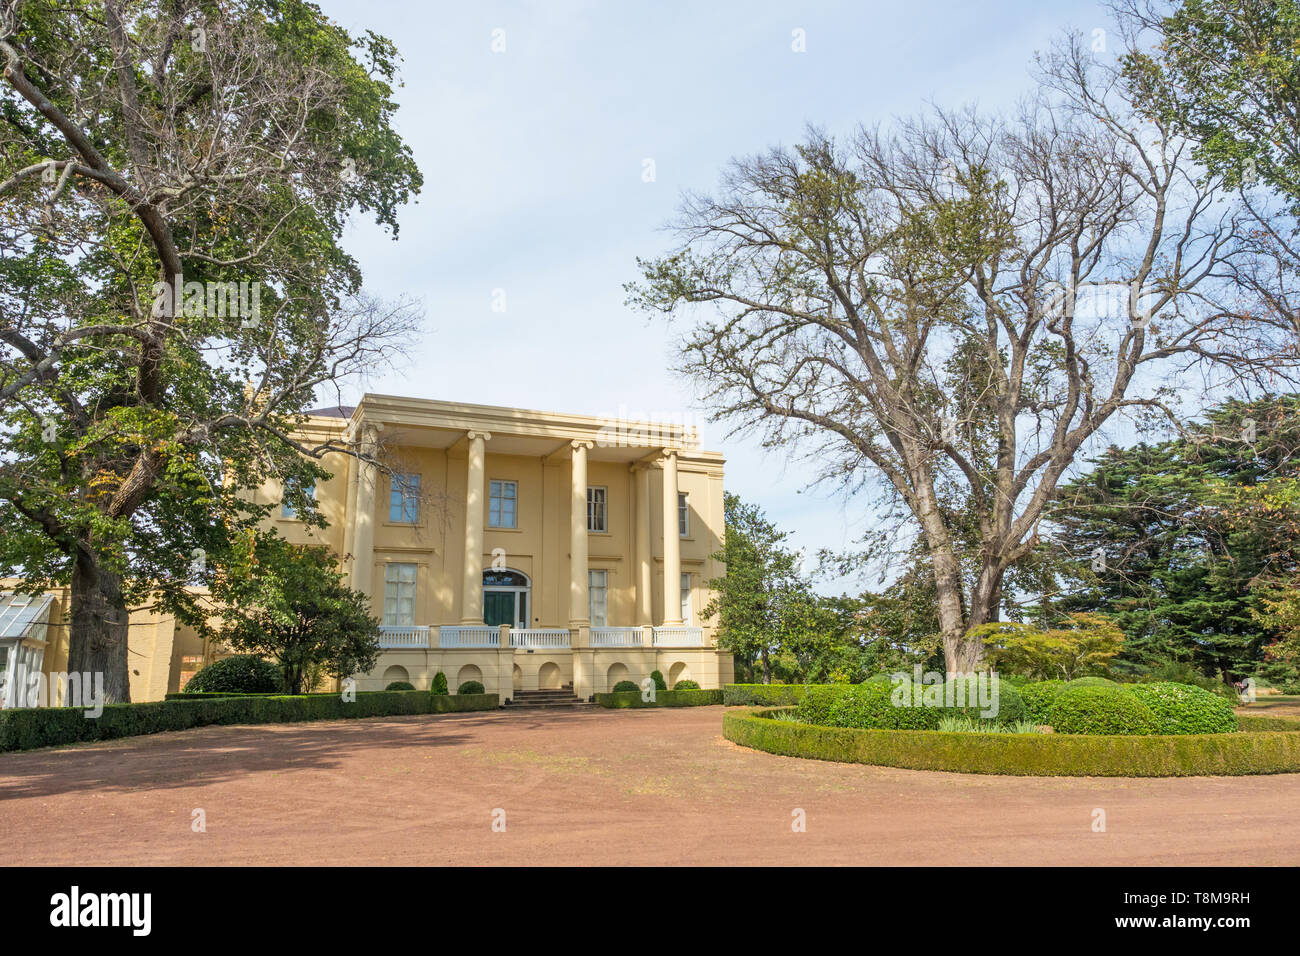 TASMANIA, AUSTRALIA - MARCH 4, 2019: A view of the front of Clarendon House near the town of Evandale in Tasmania, Australia. Stock Photo